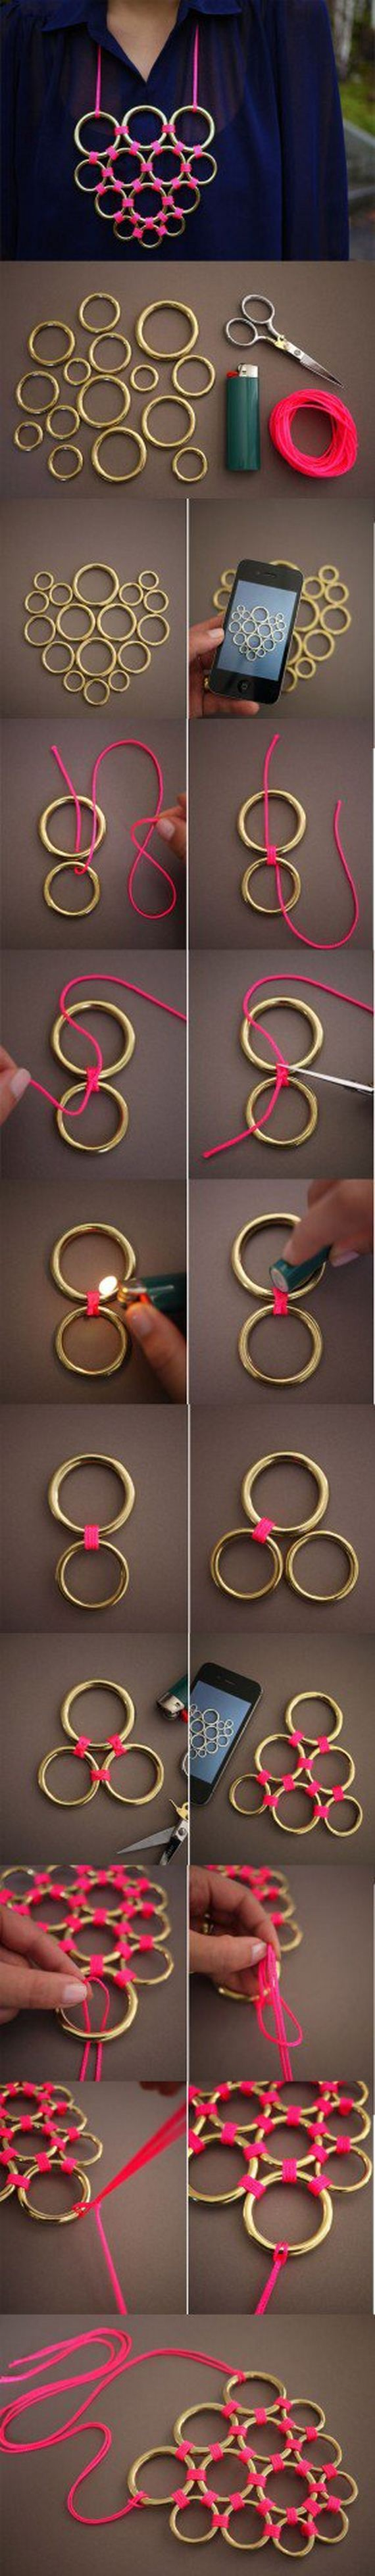 21-diy-statement-necklace-jewelry-tutorial-ideas